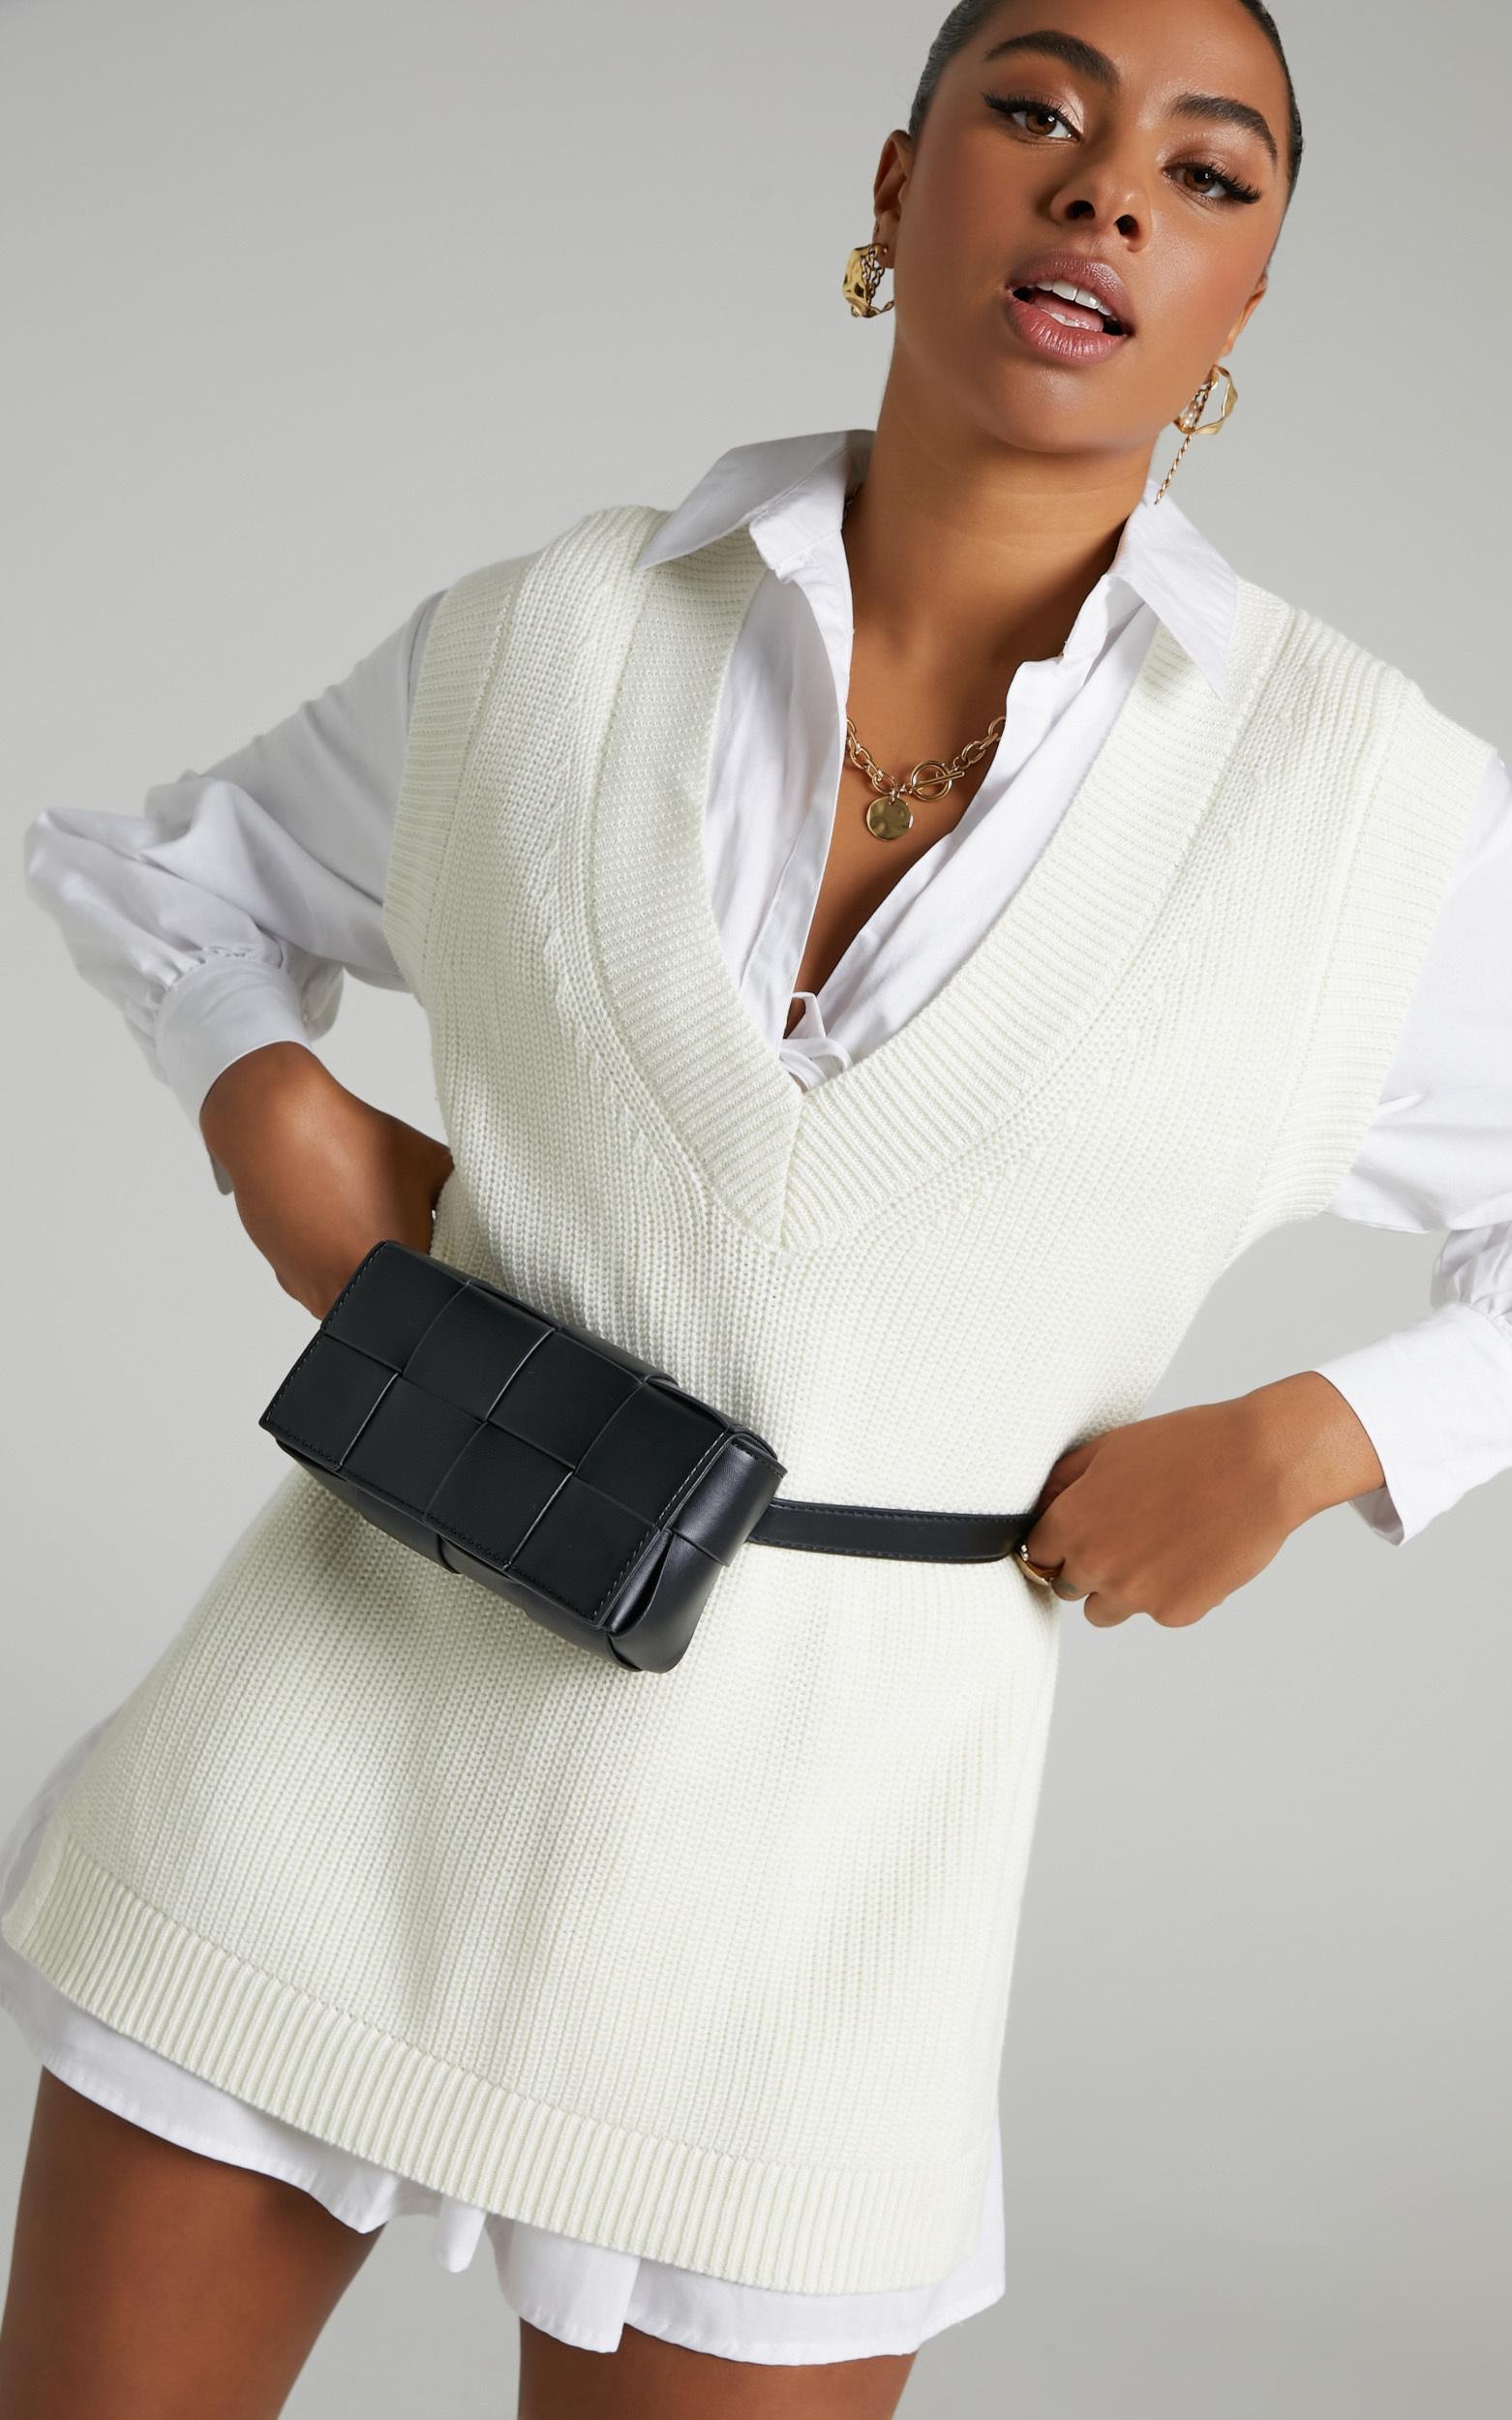 Saira Oversized Knit Vest in Cream - 06, CRE1, hi-res image number null